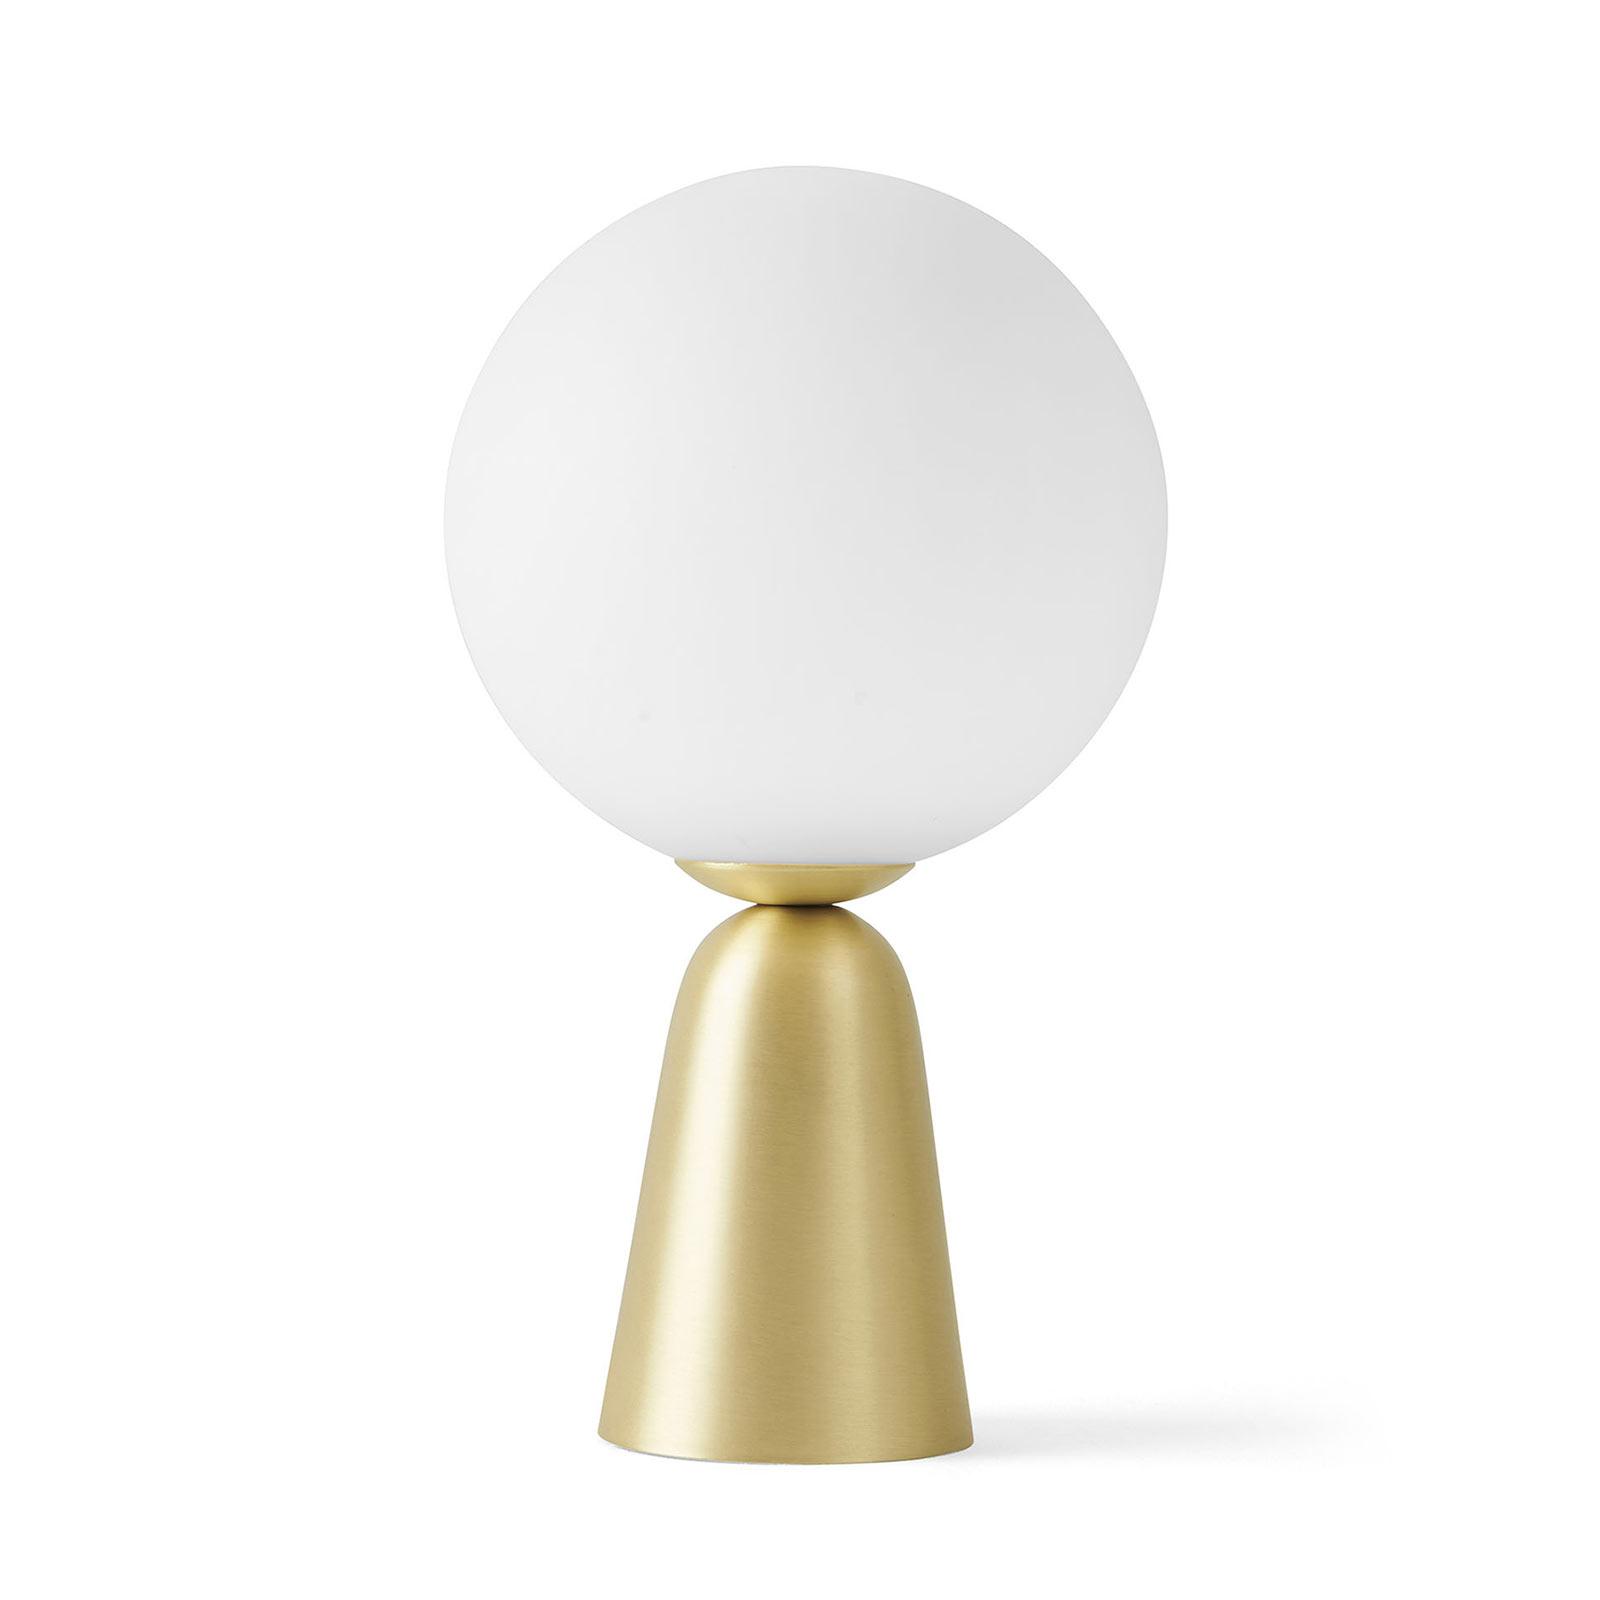 Tafellamp Lunar met gouden voet, Ø 12 cm